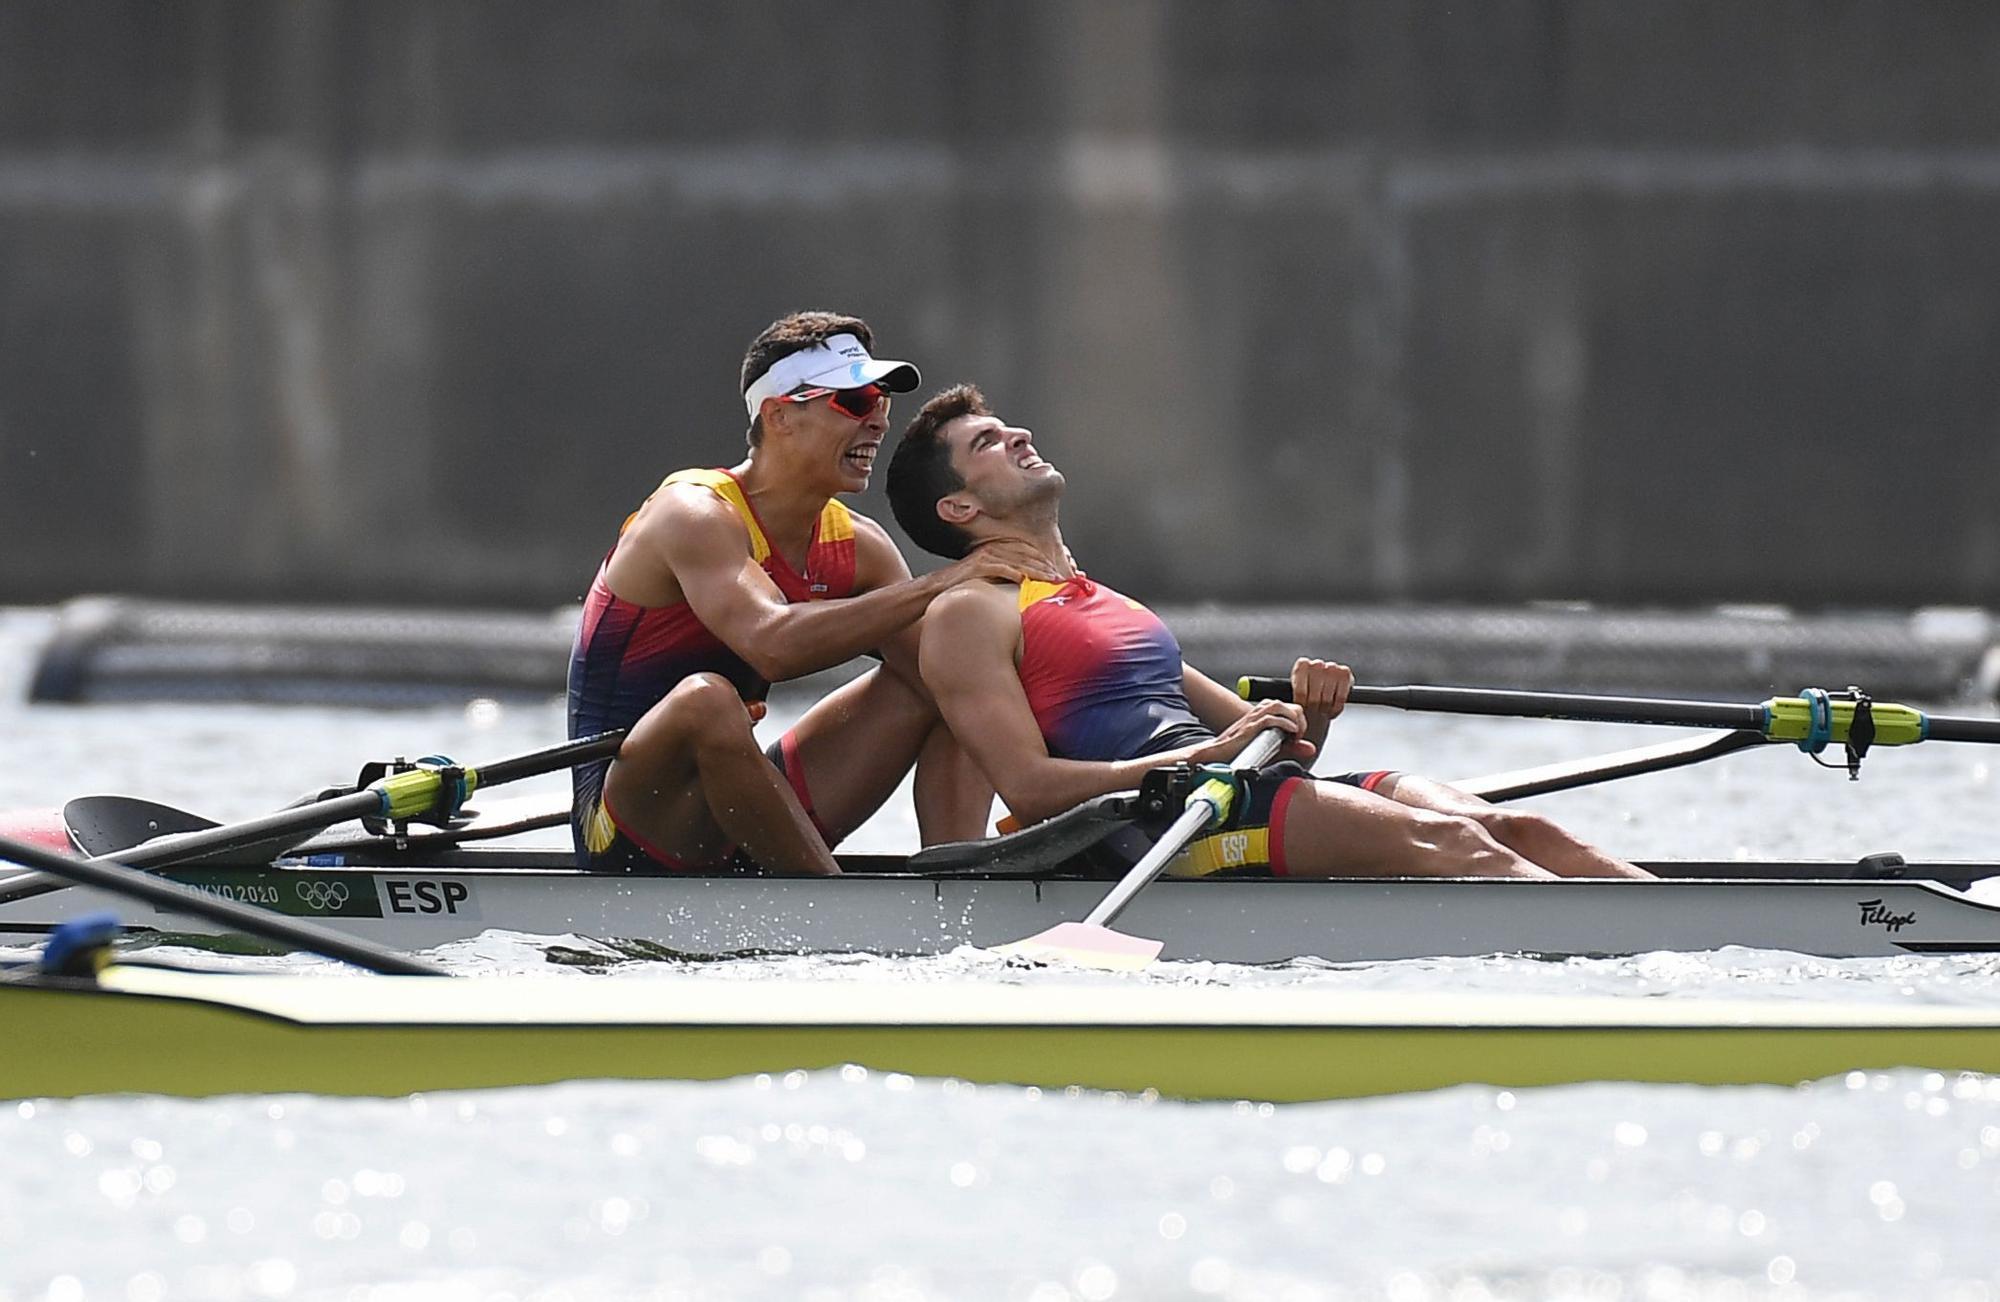 MAnel Balastegui i Caetano Horta guanyen la Final B